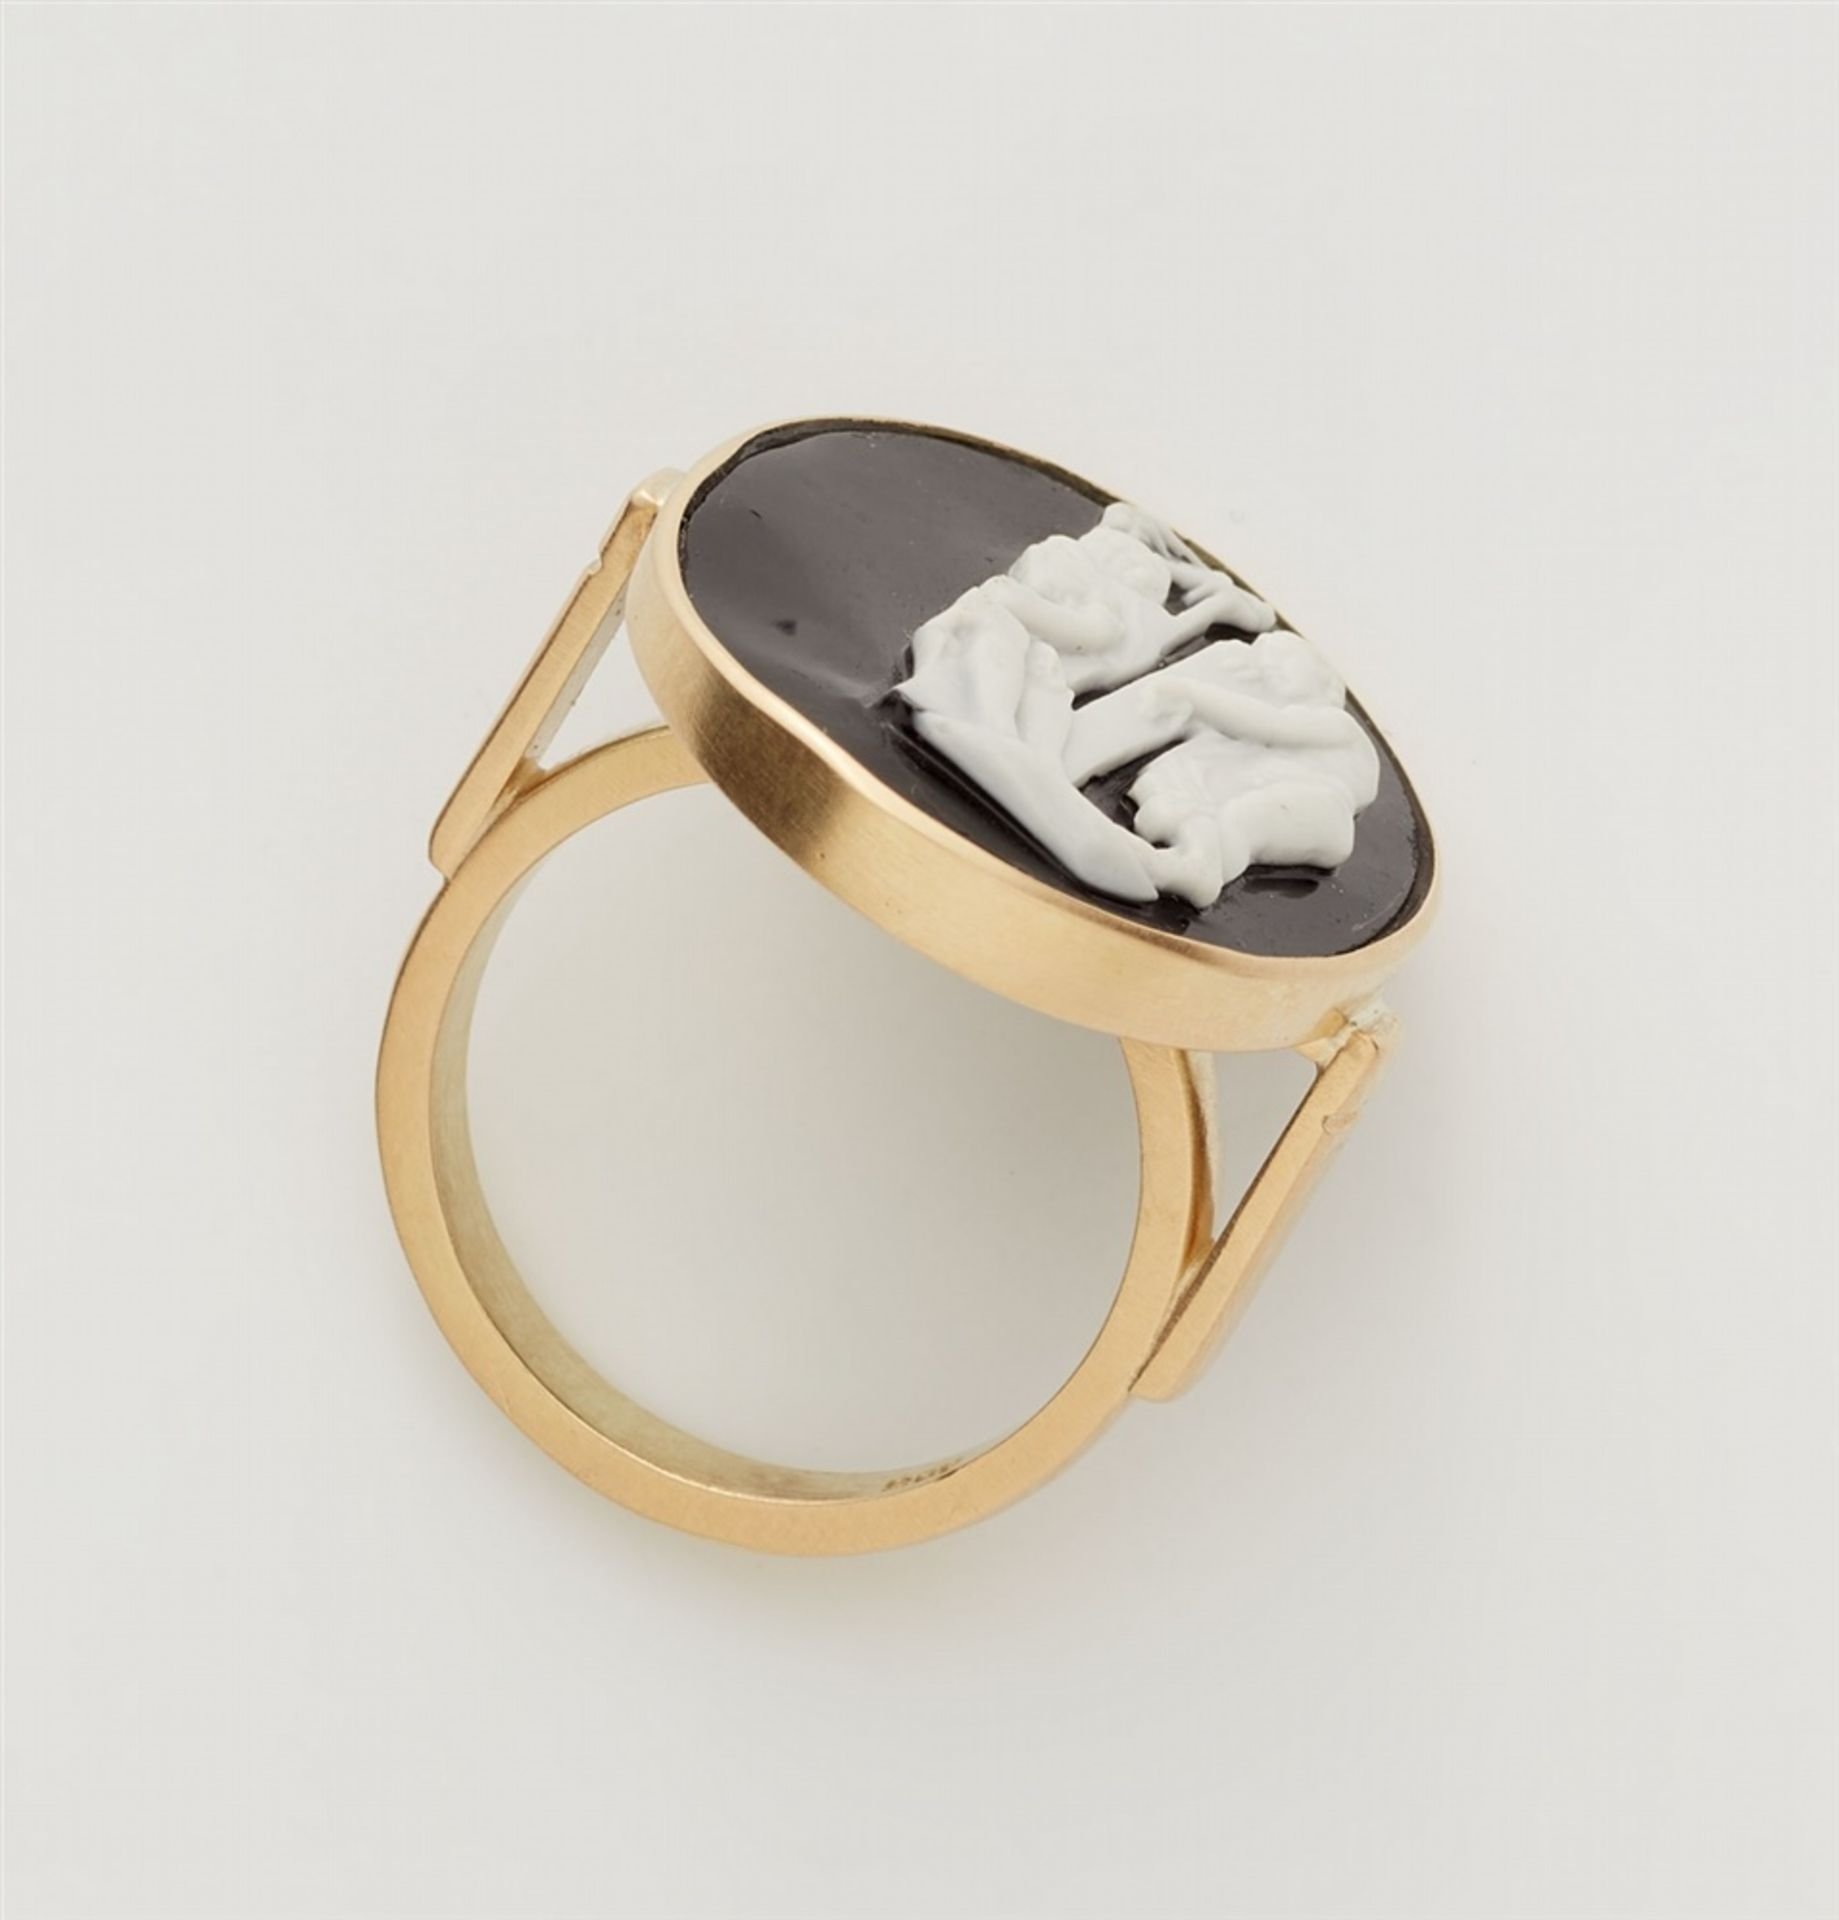 Ring mit klassizistischer Kamee - Bild 3 aus 3